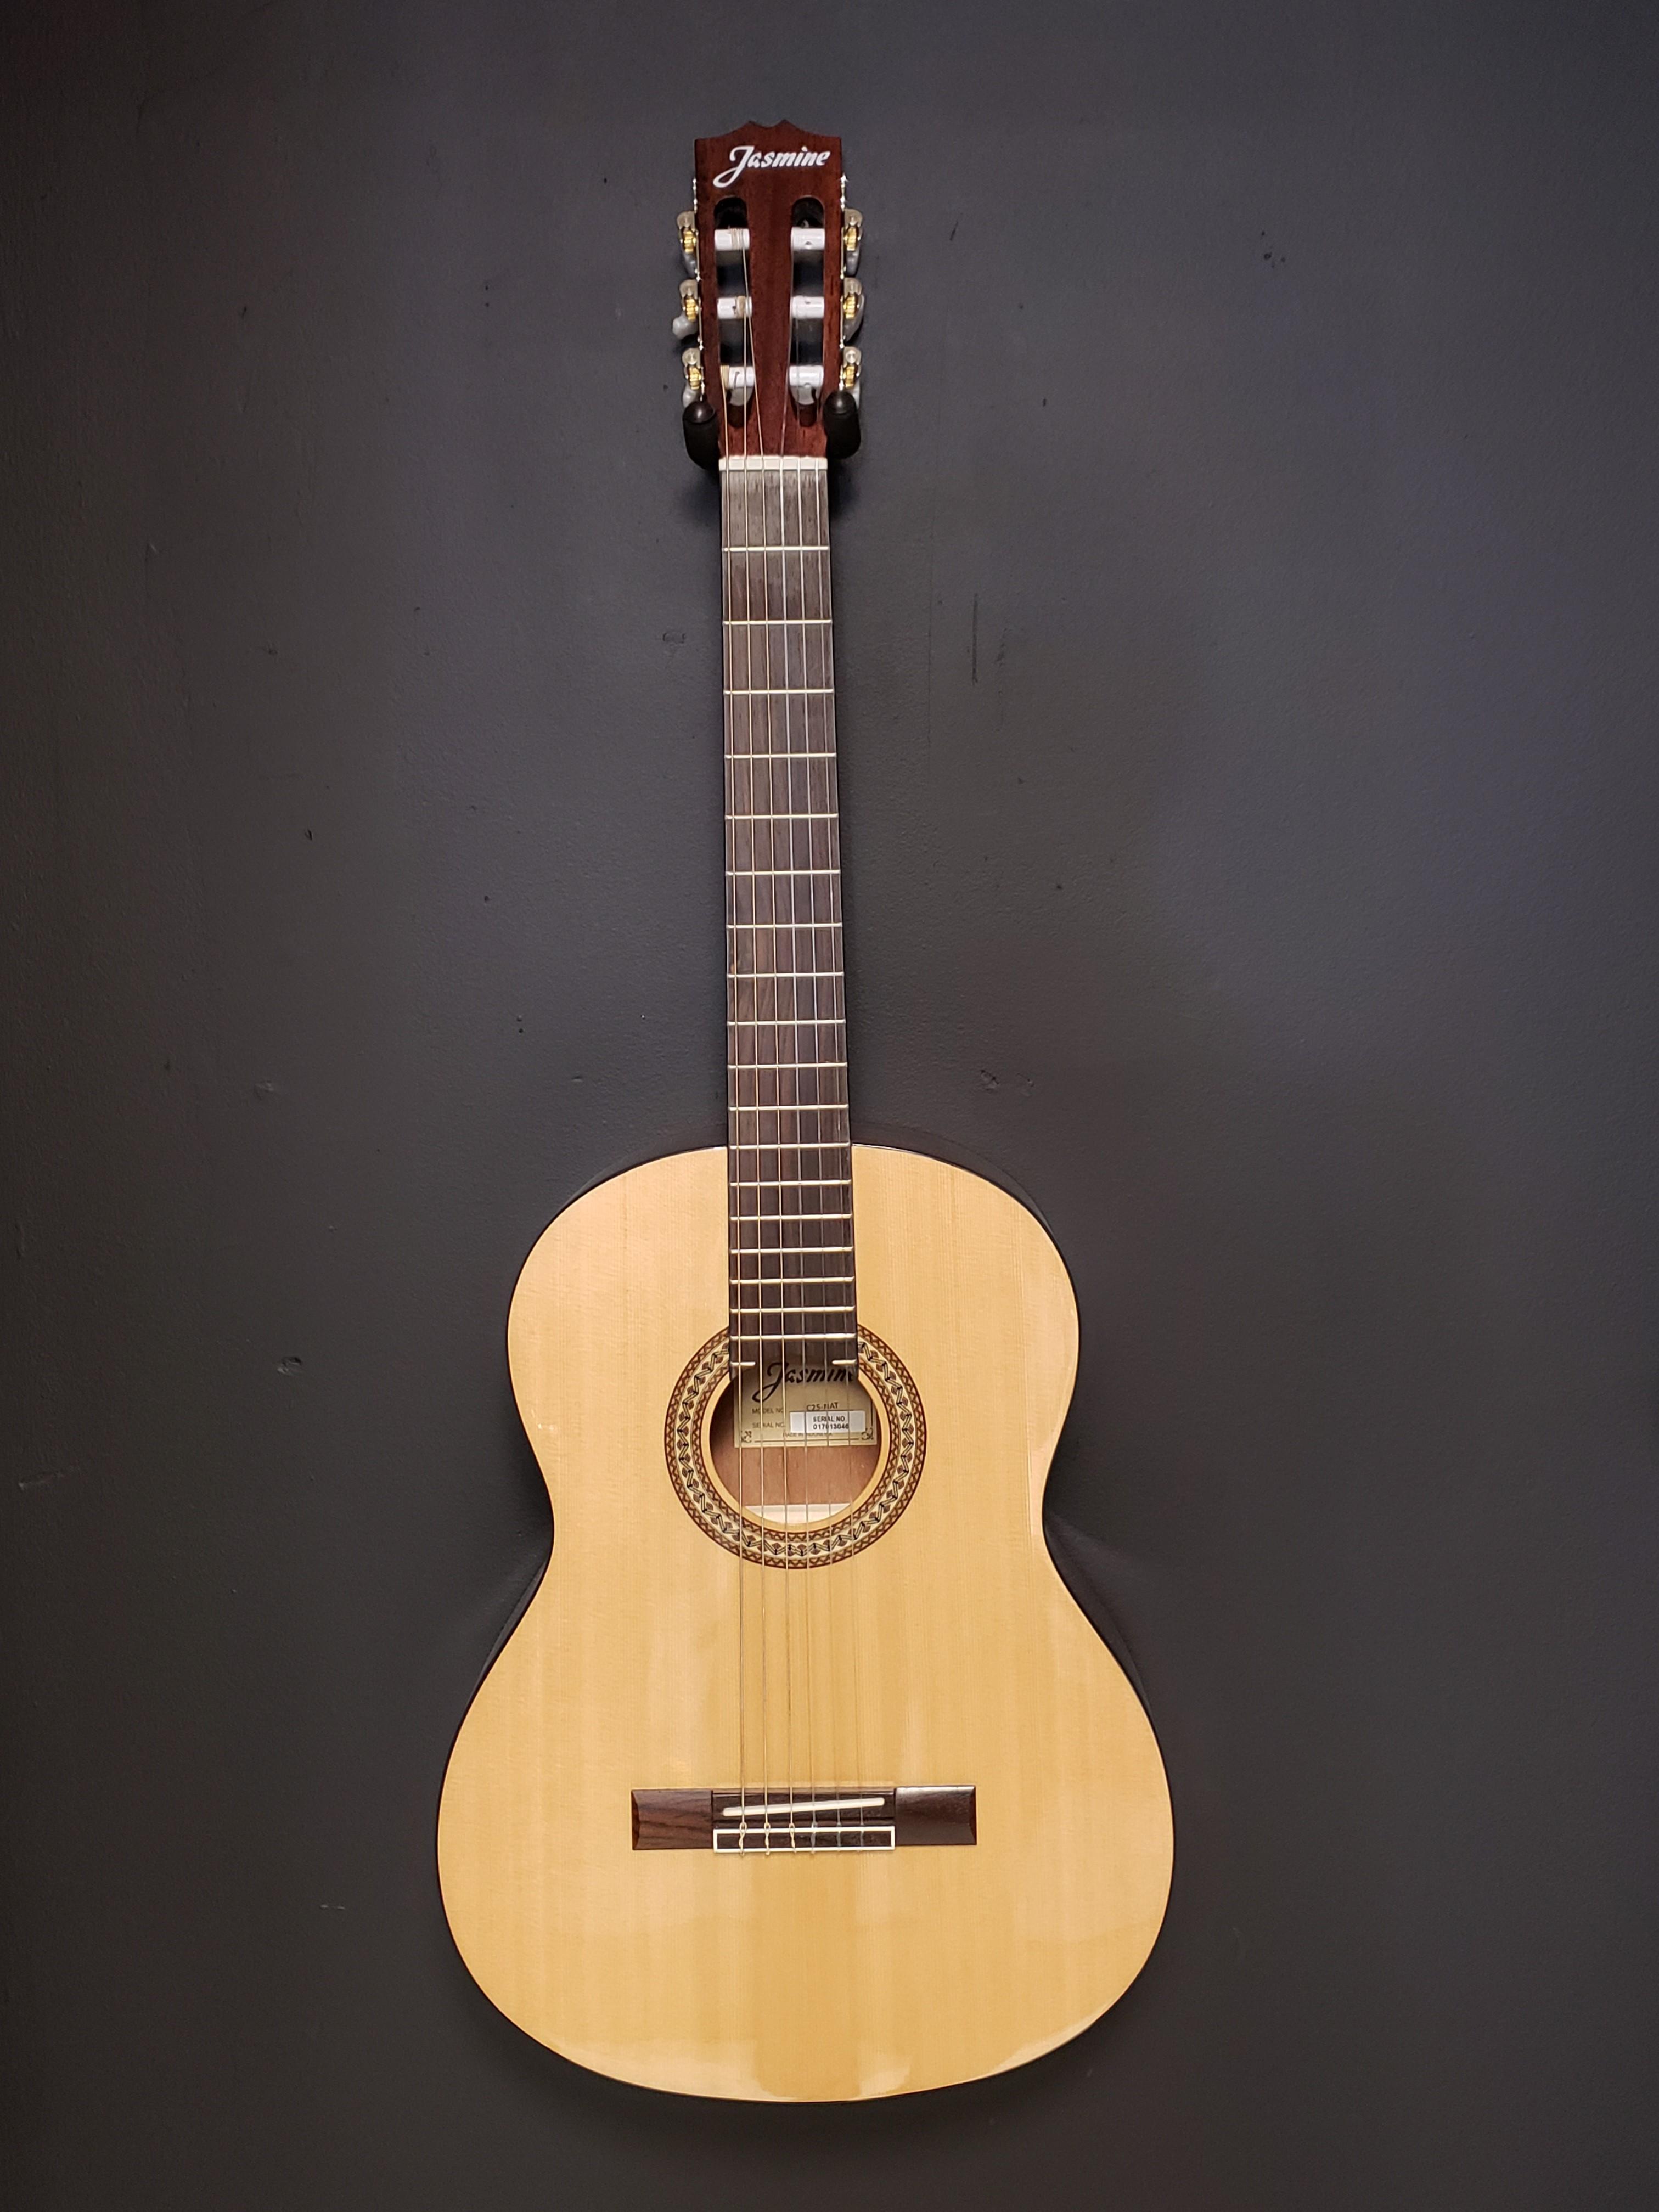 Jasmine JC-25 Classical Acoustic